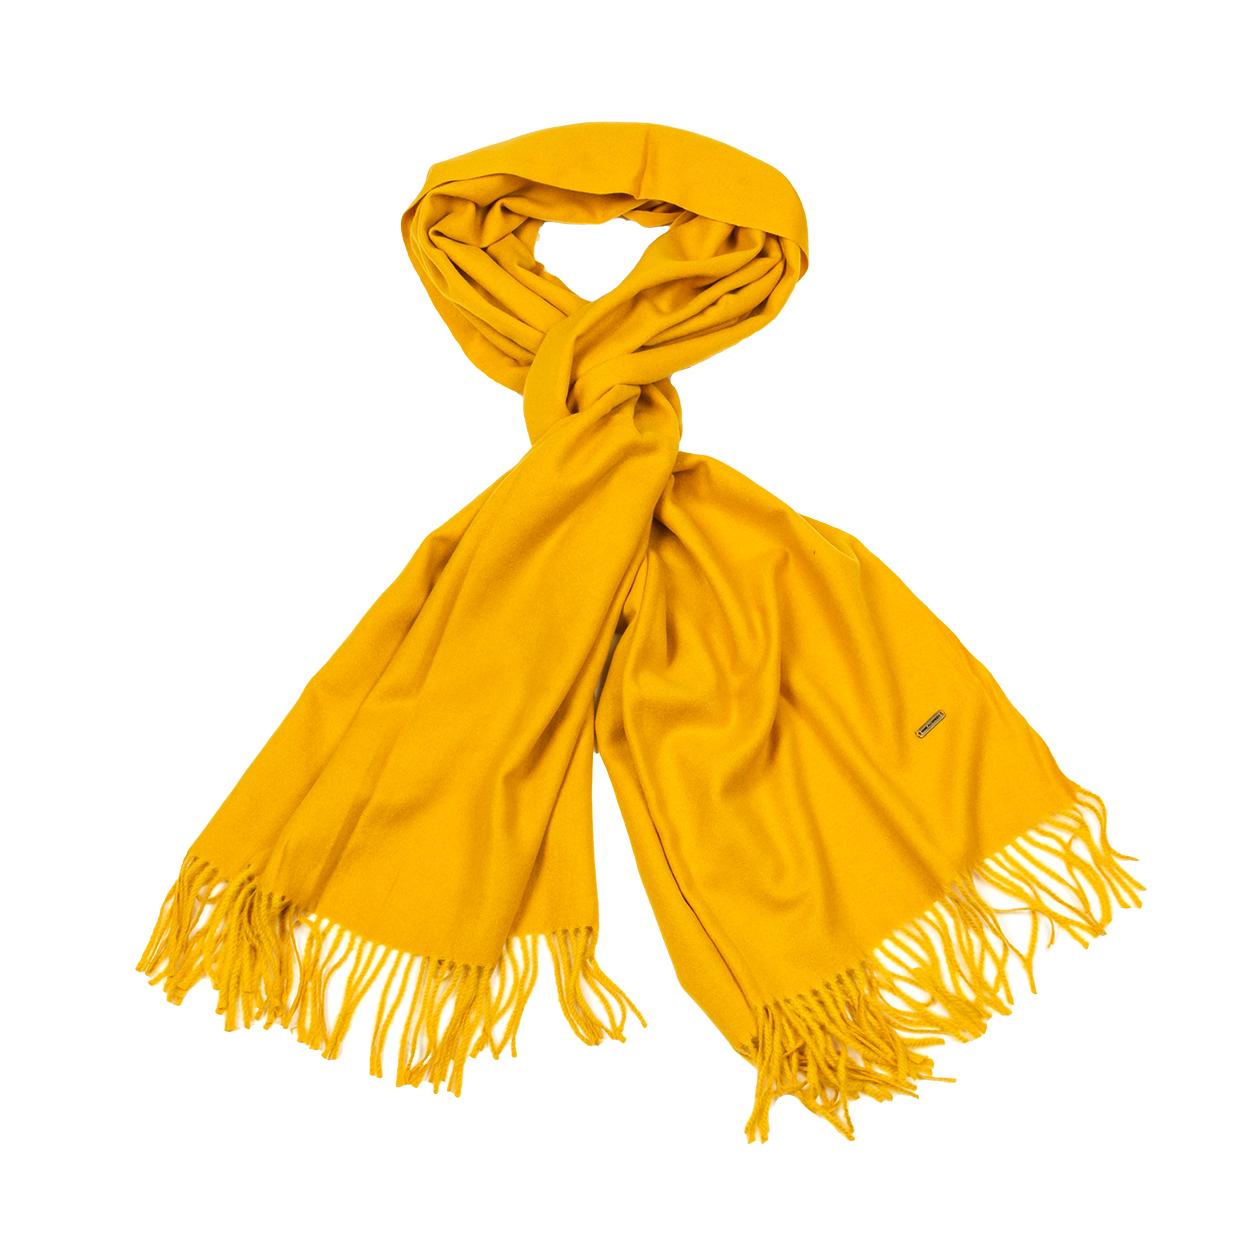 Echarpe  occitan jaune moutarde